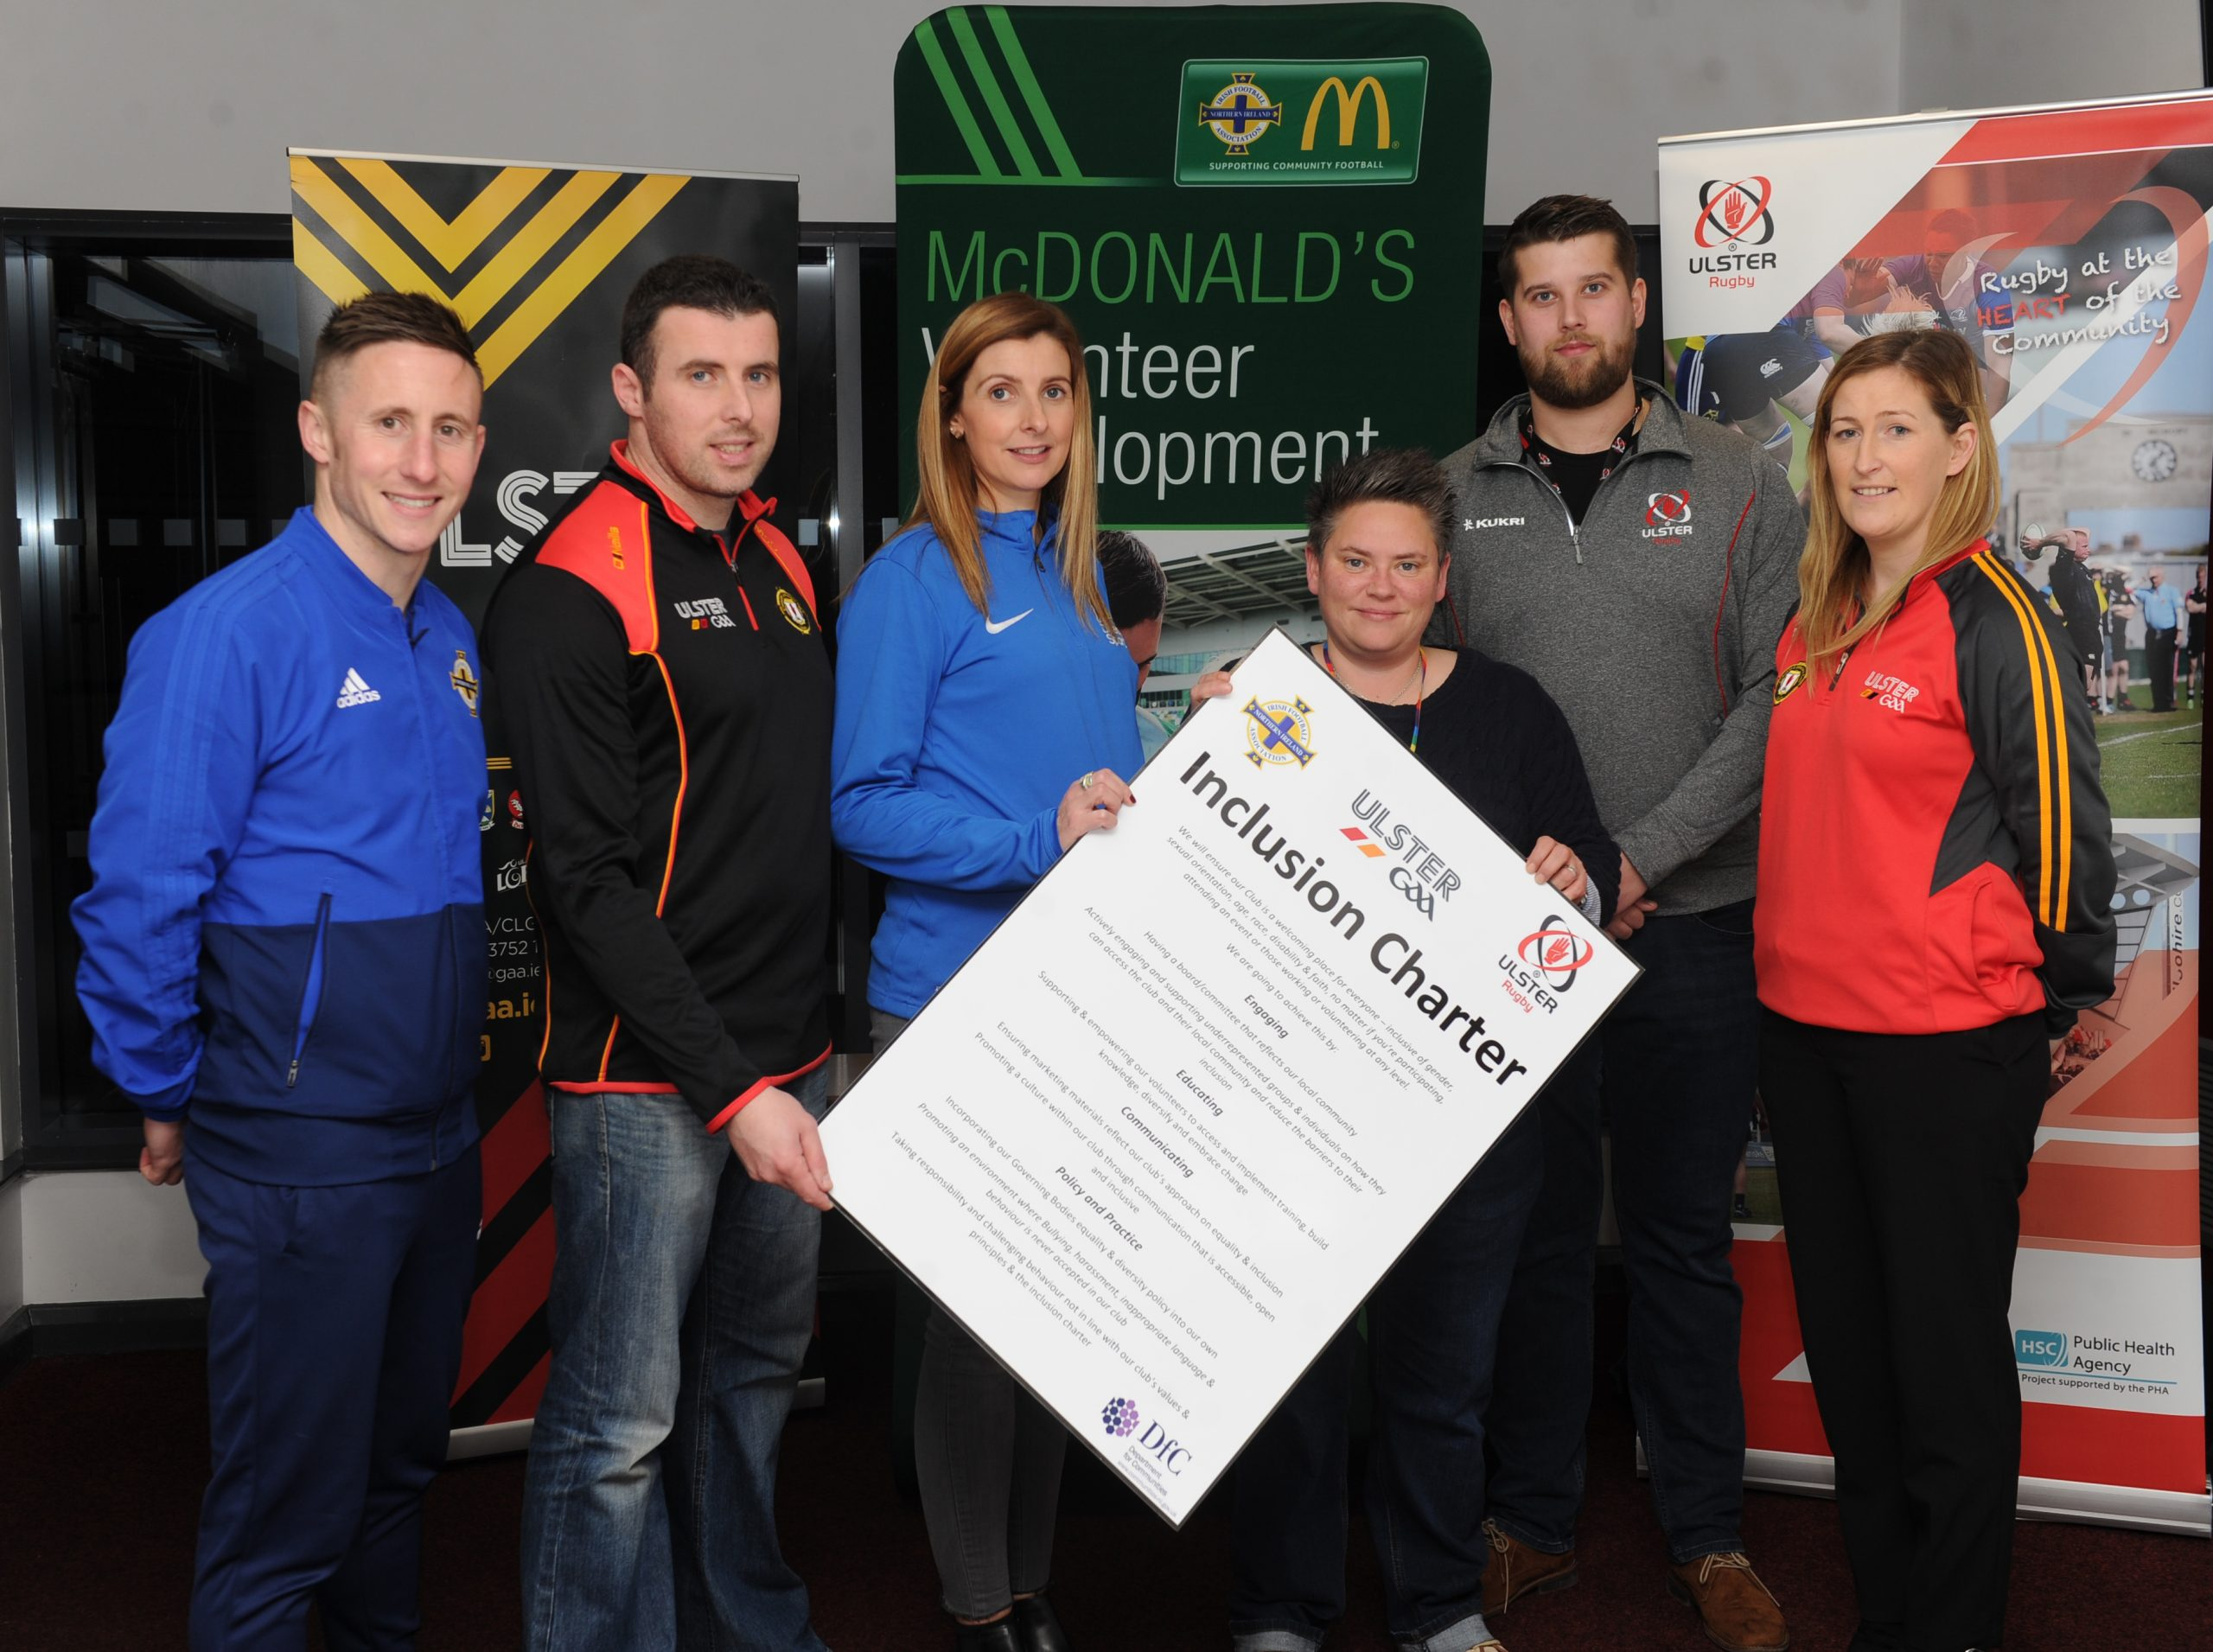 Ulster GAA take part in Multi-Sport Volunteer Forum